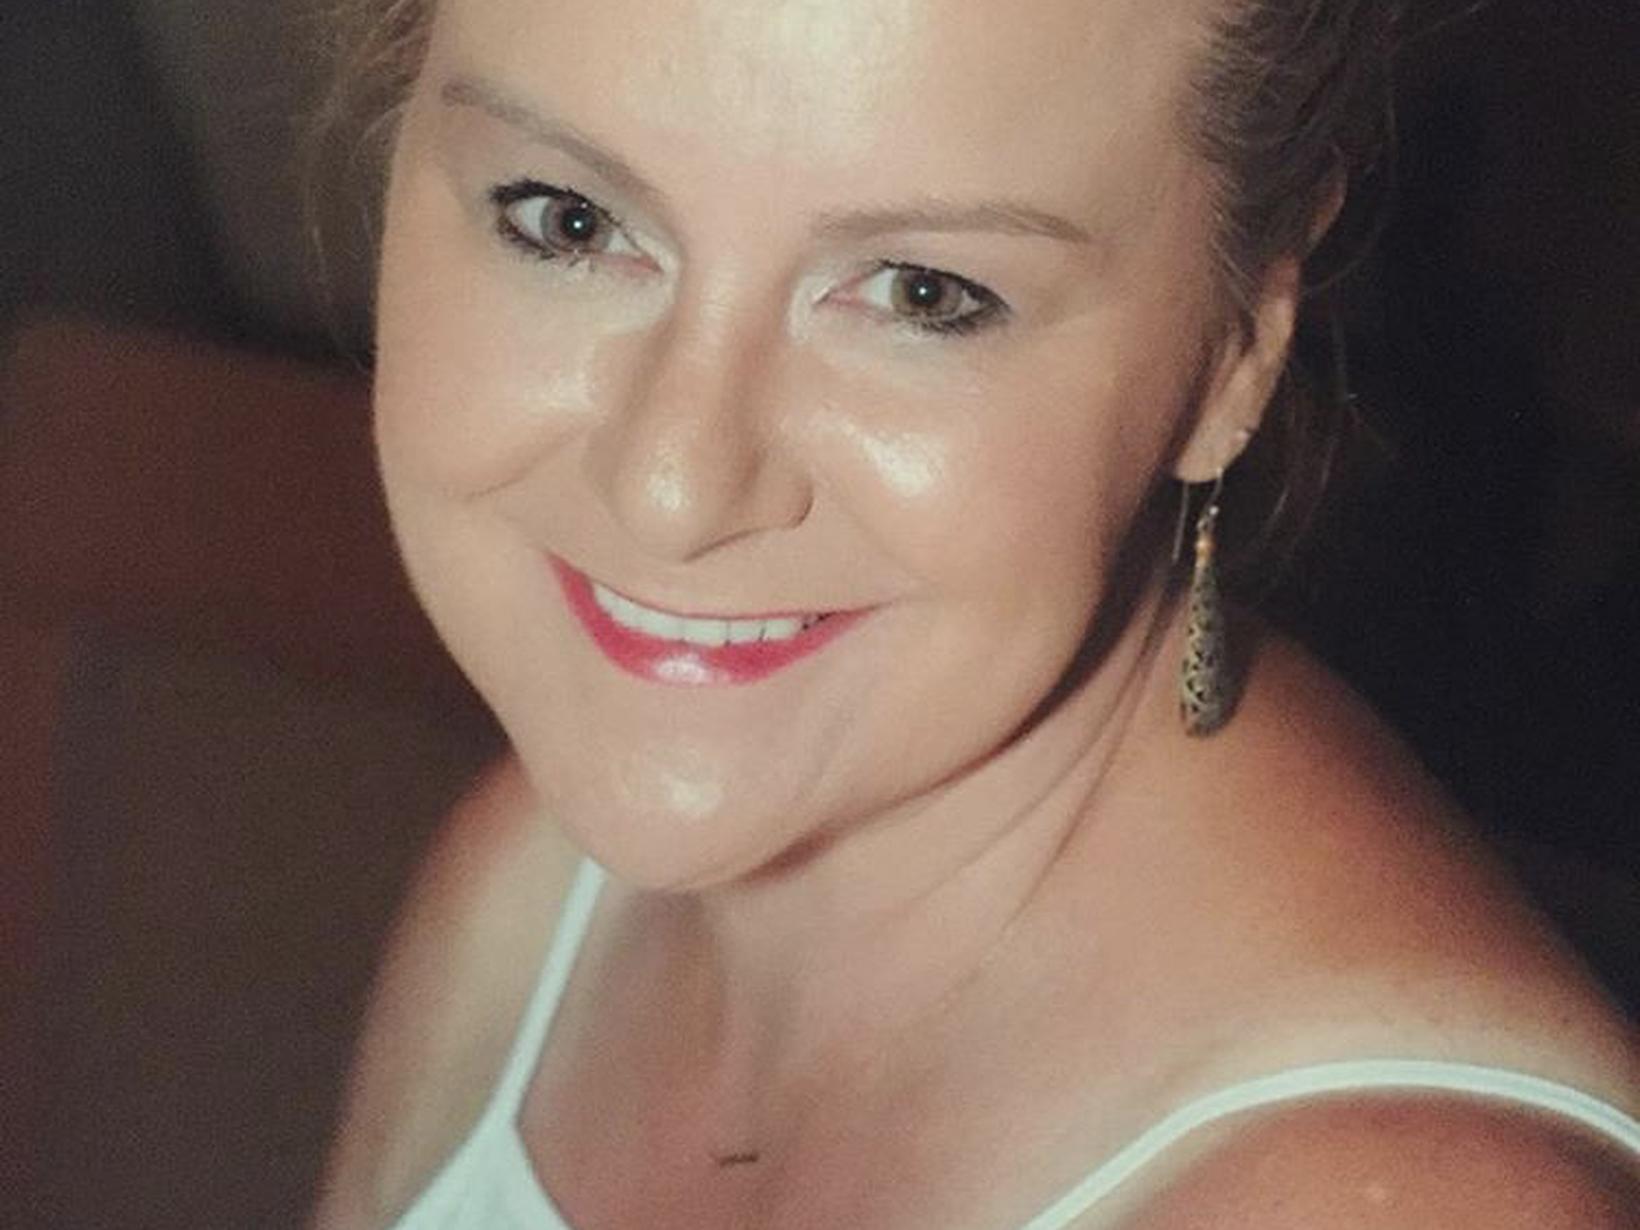 Tania from Newstead, Victoria, Australia